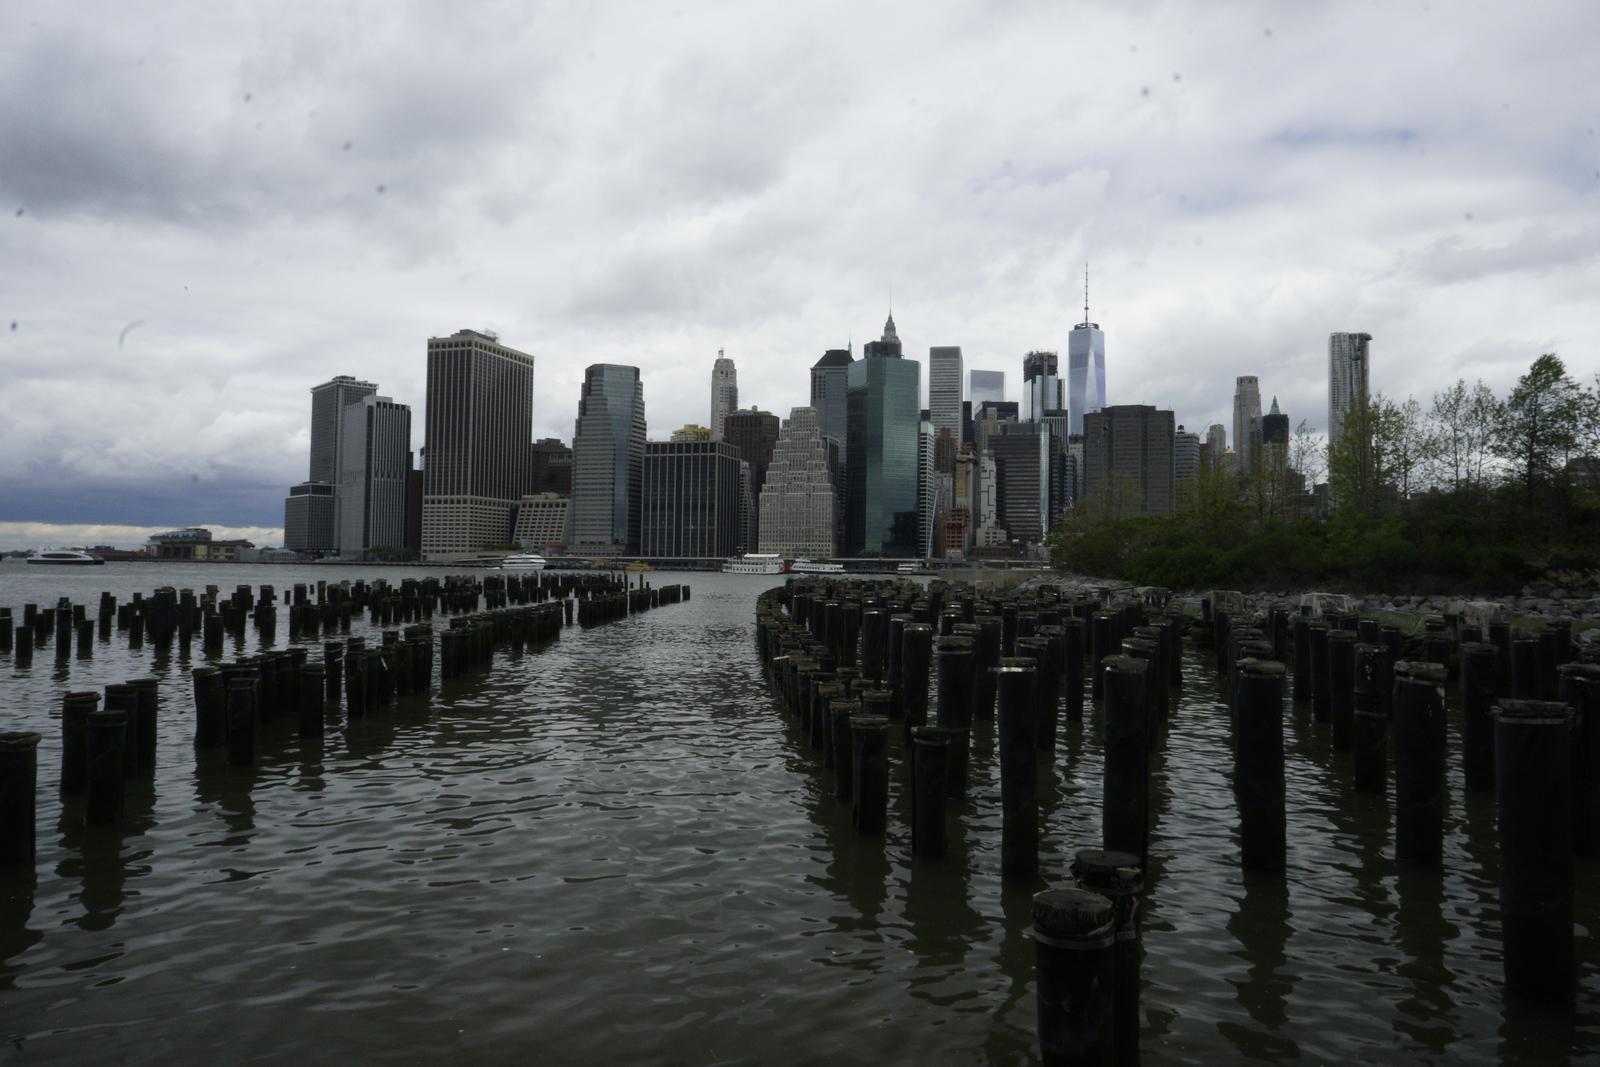 Day 01 -  002 - New York  - Brooklyn Piers